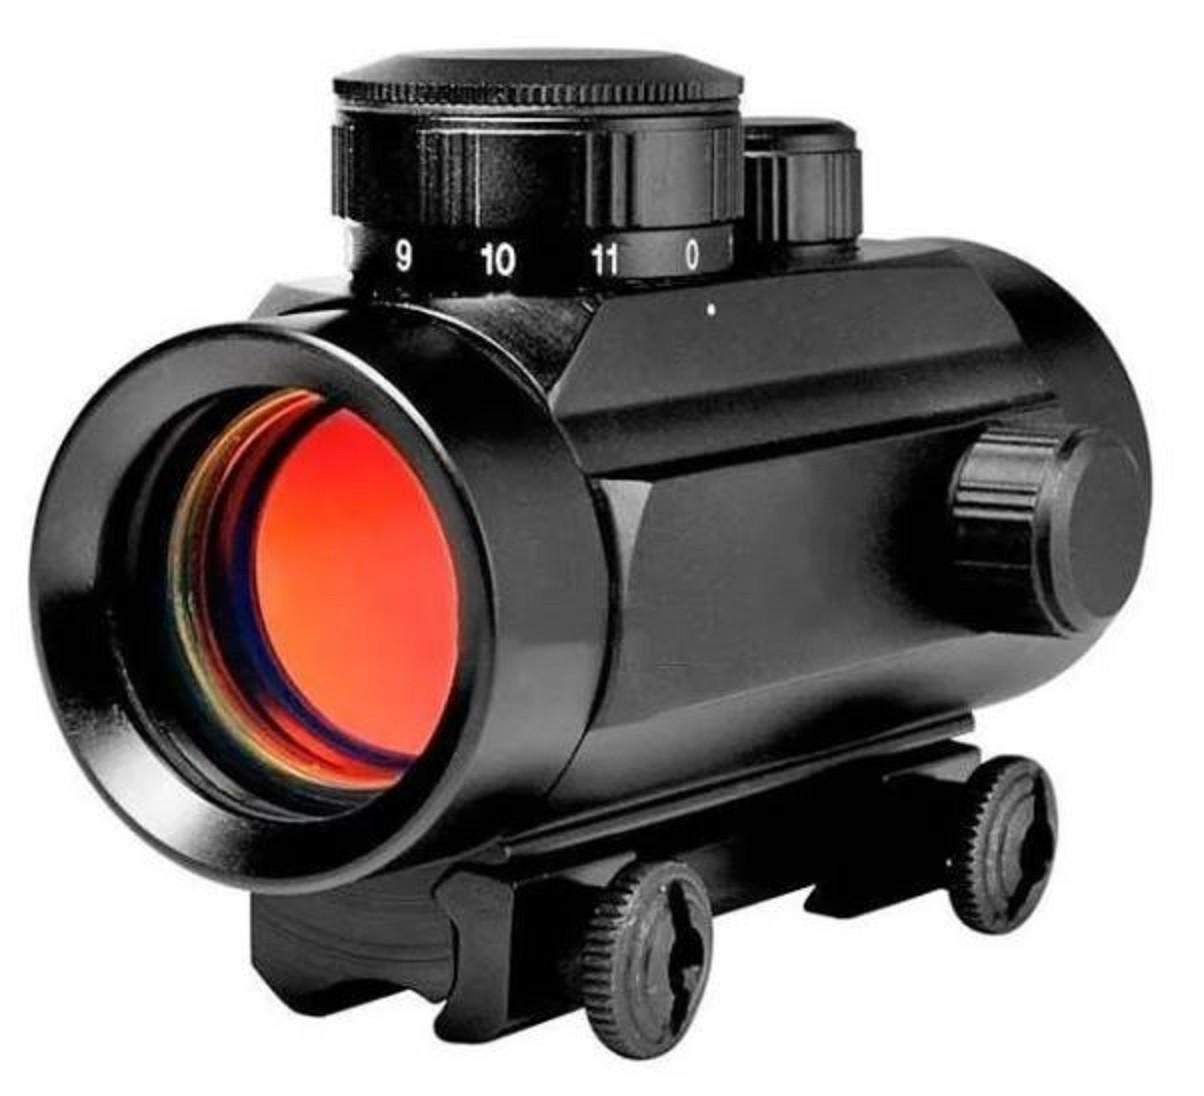 Mira Red Dot Para Carabina Trilho 11mm - Cbc